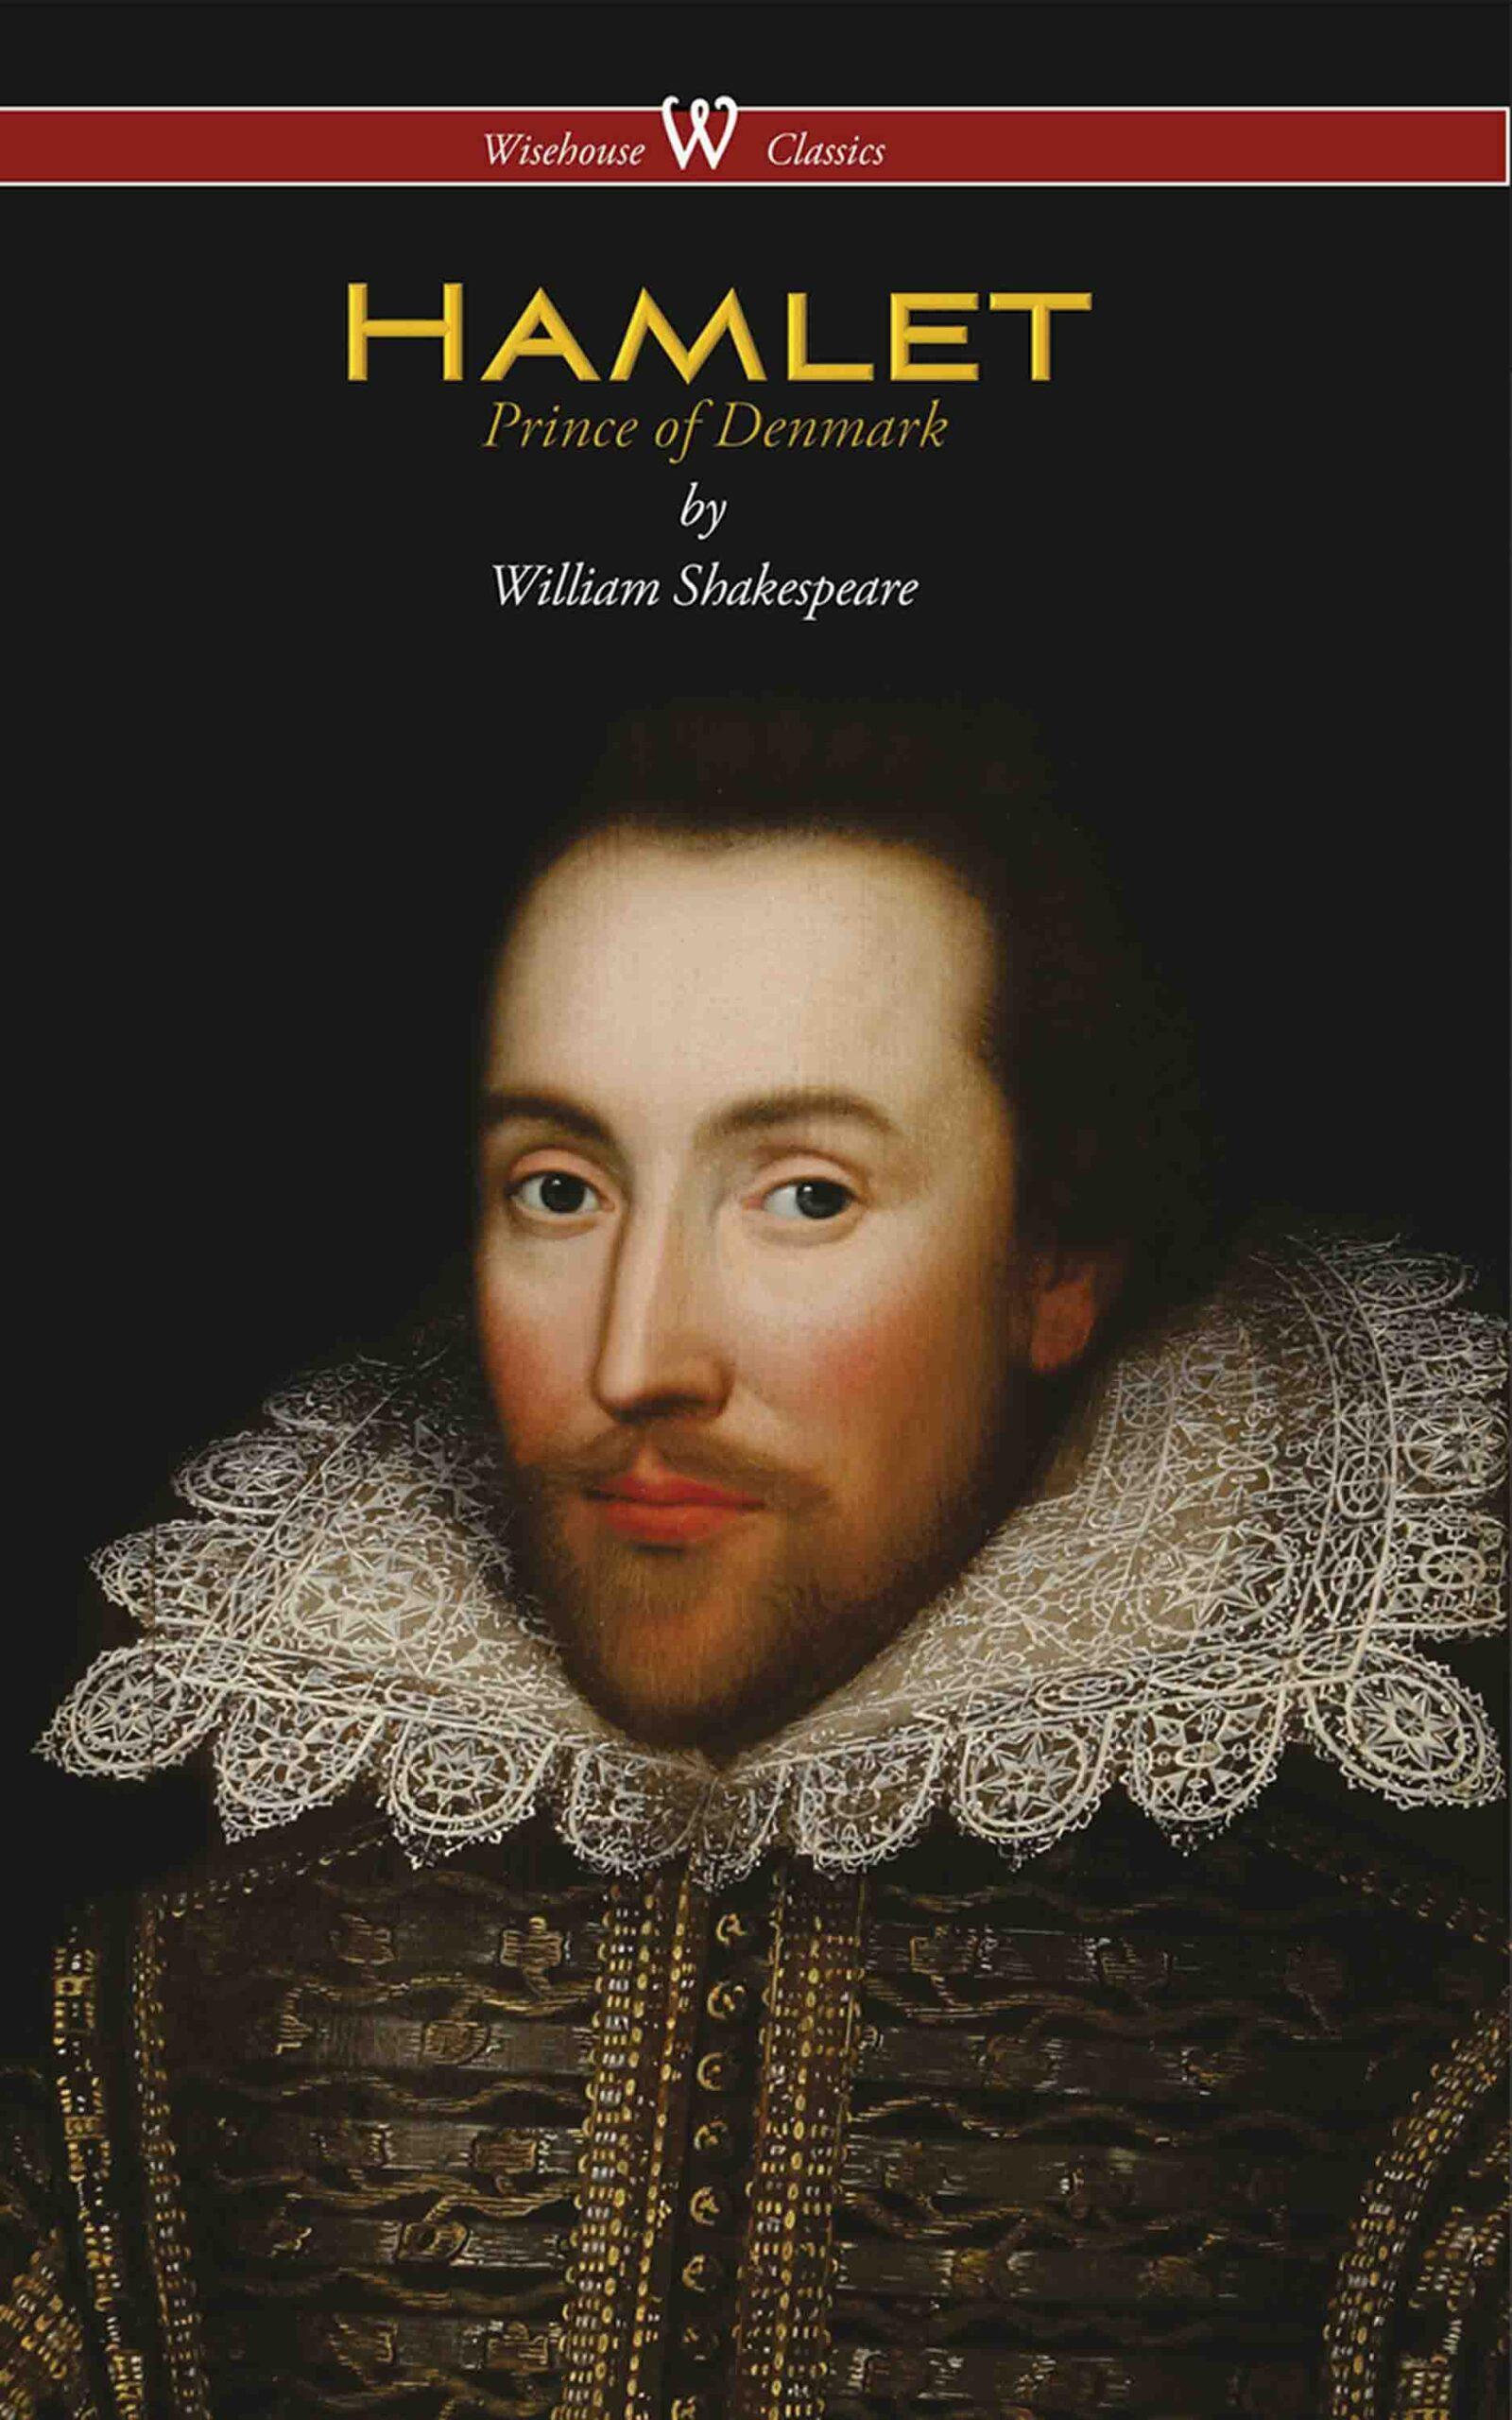 Hamlet – Prince of Denmark (Wisehouse Classics Edition)